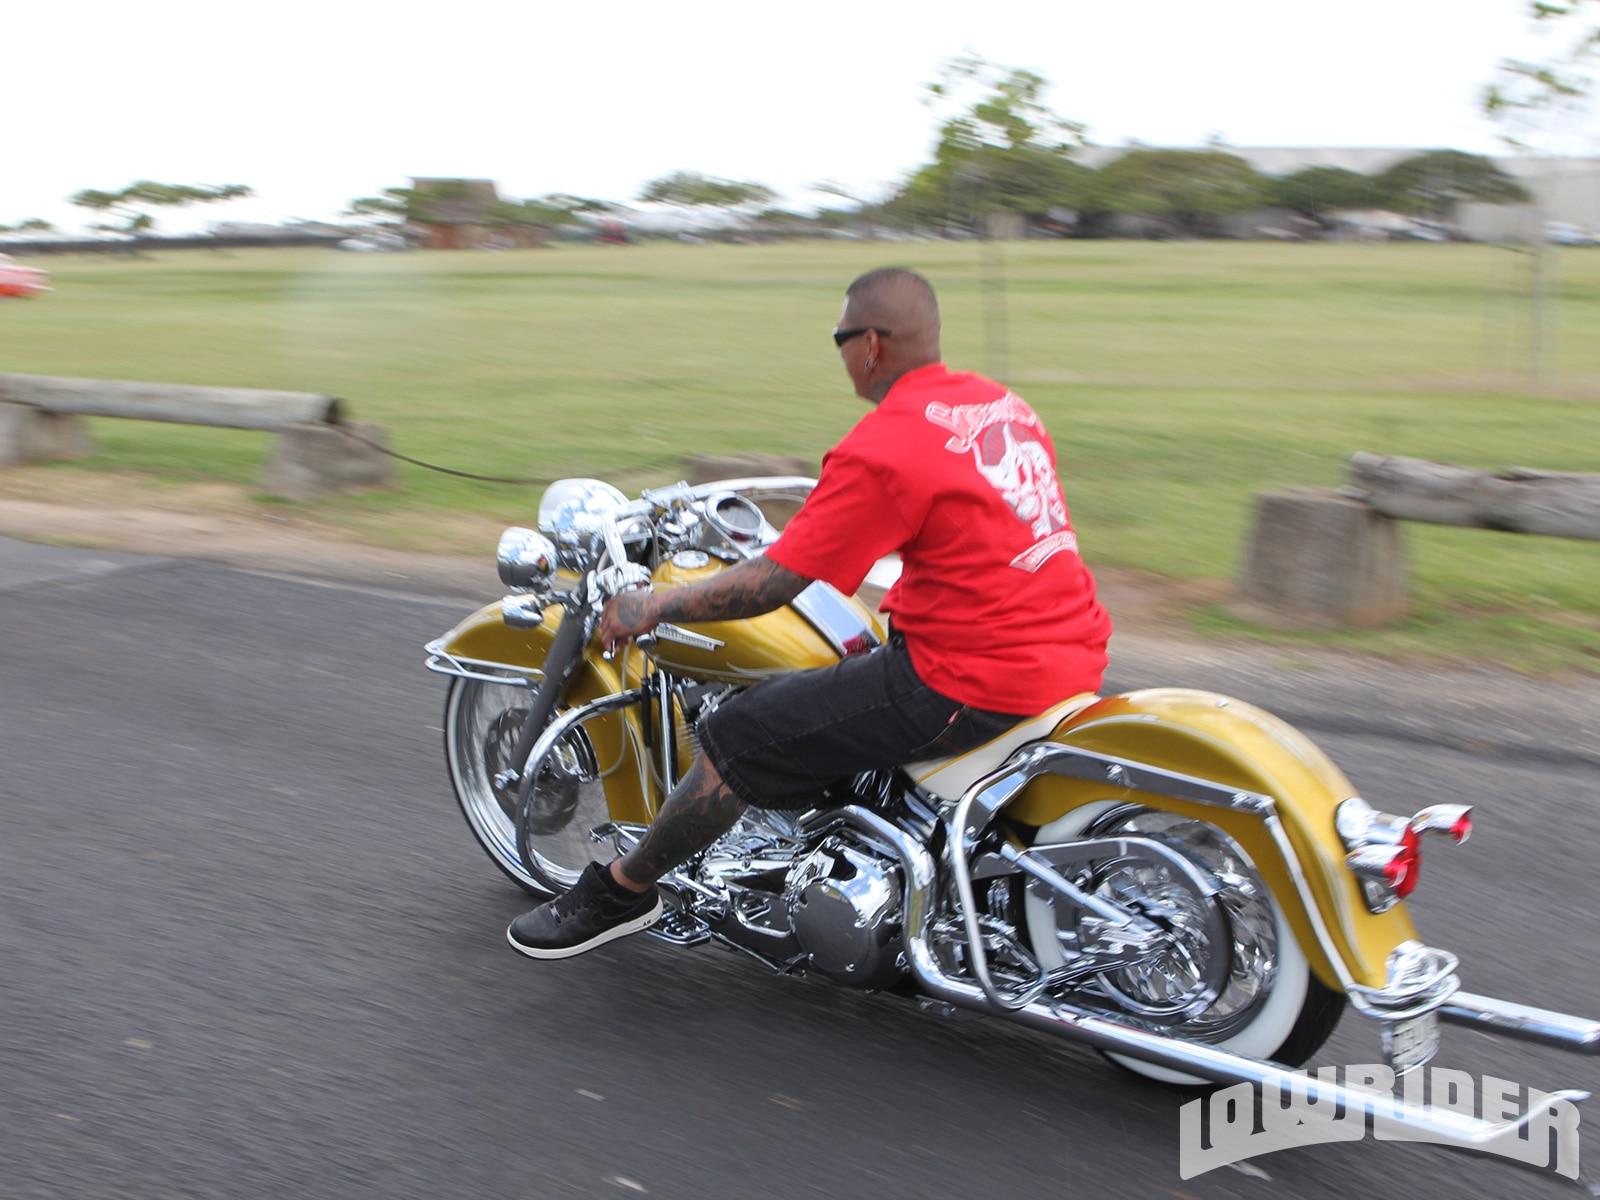 Harley Davidson Softail Deluxe Accessories